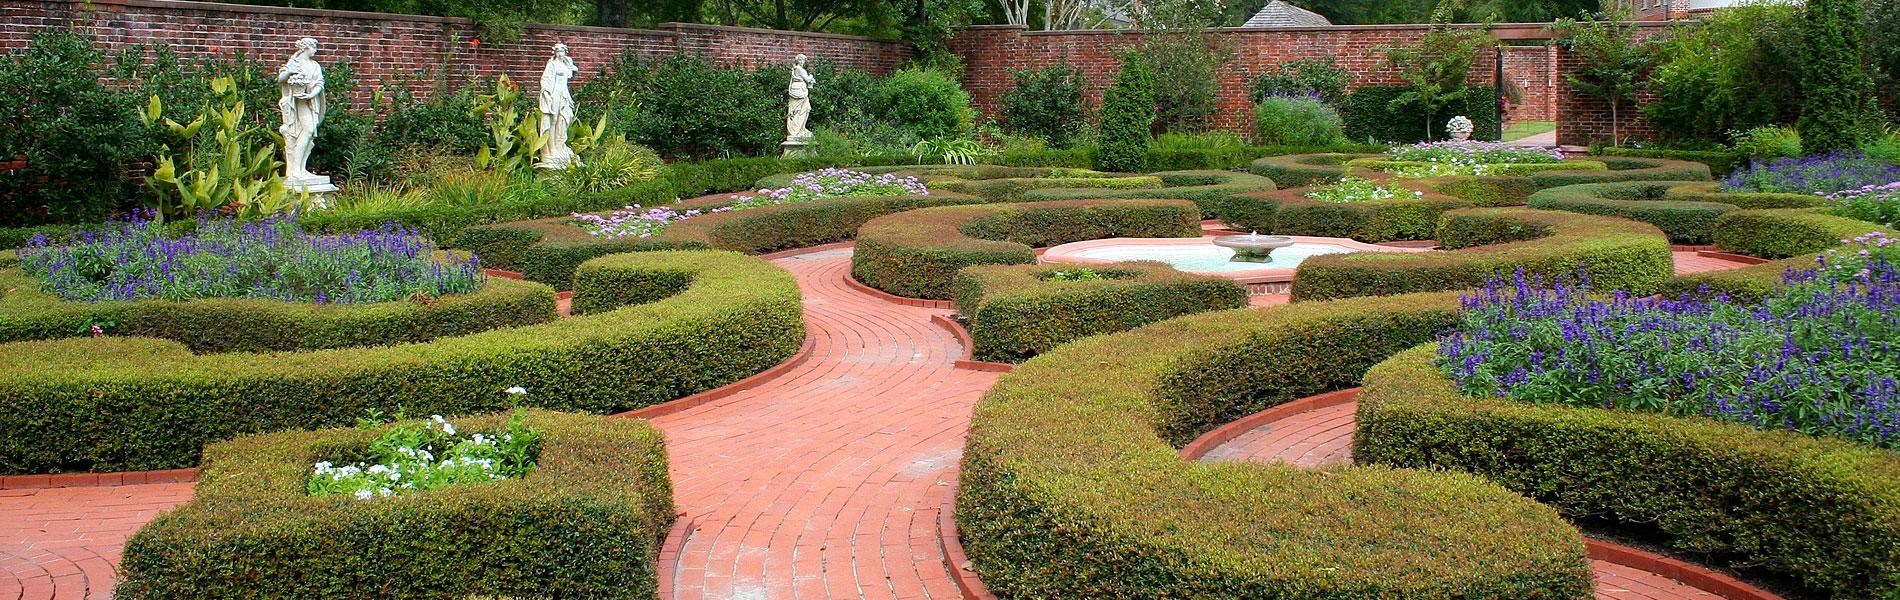 Il giardino all 39 italiana - Giardino all italiana ...